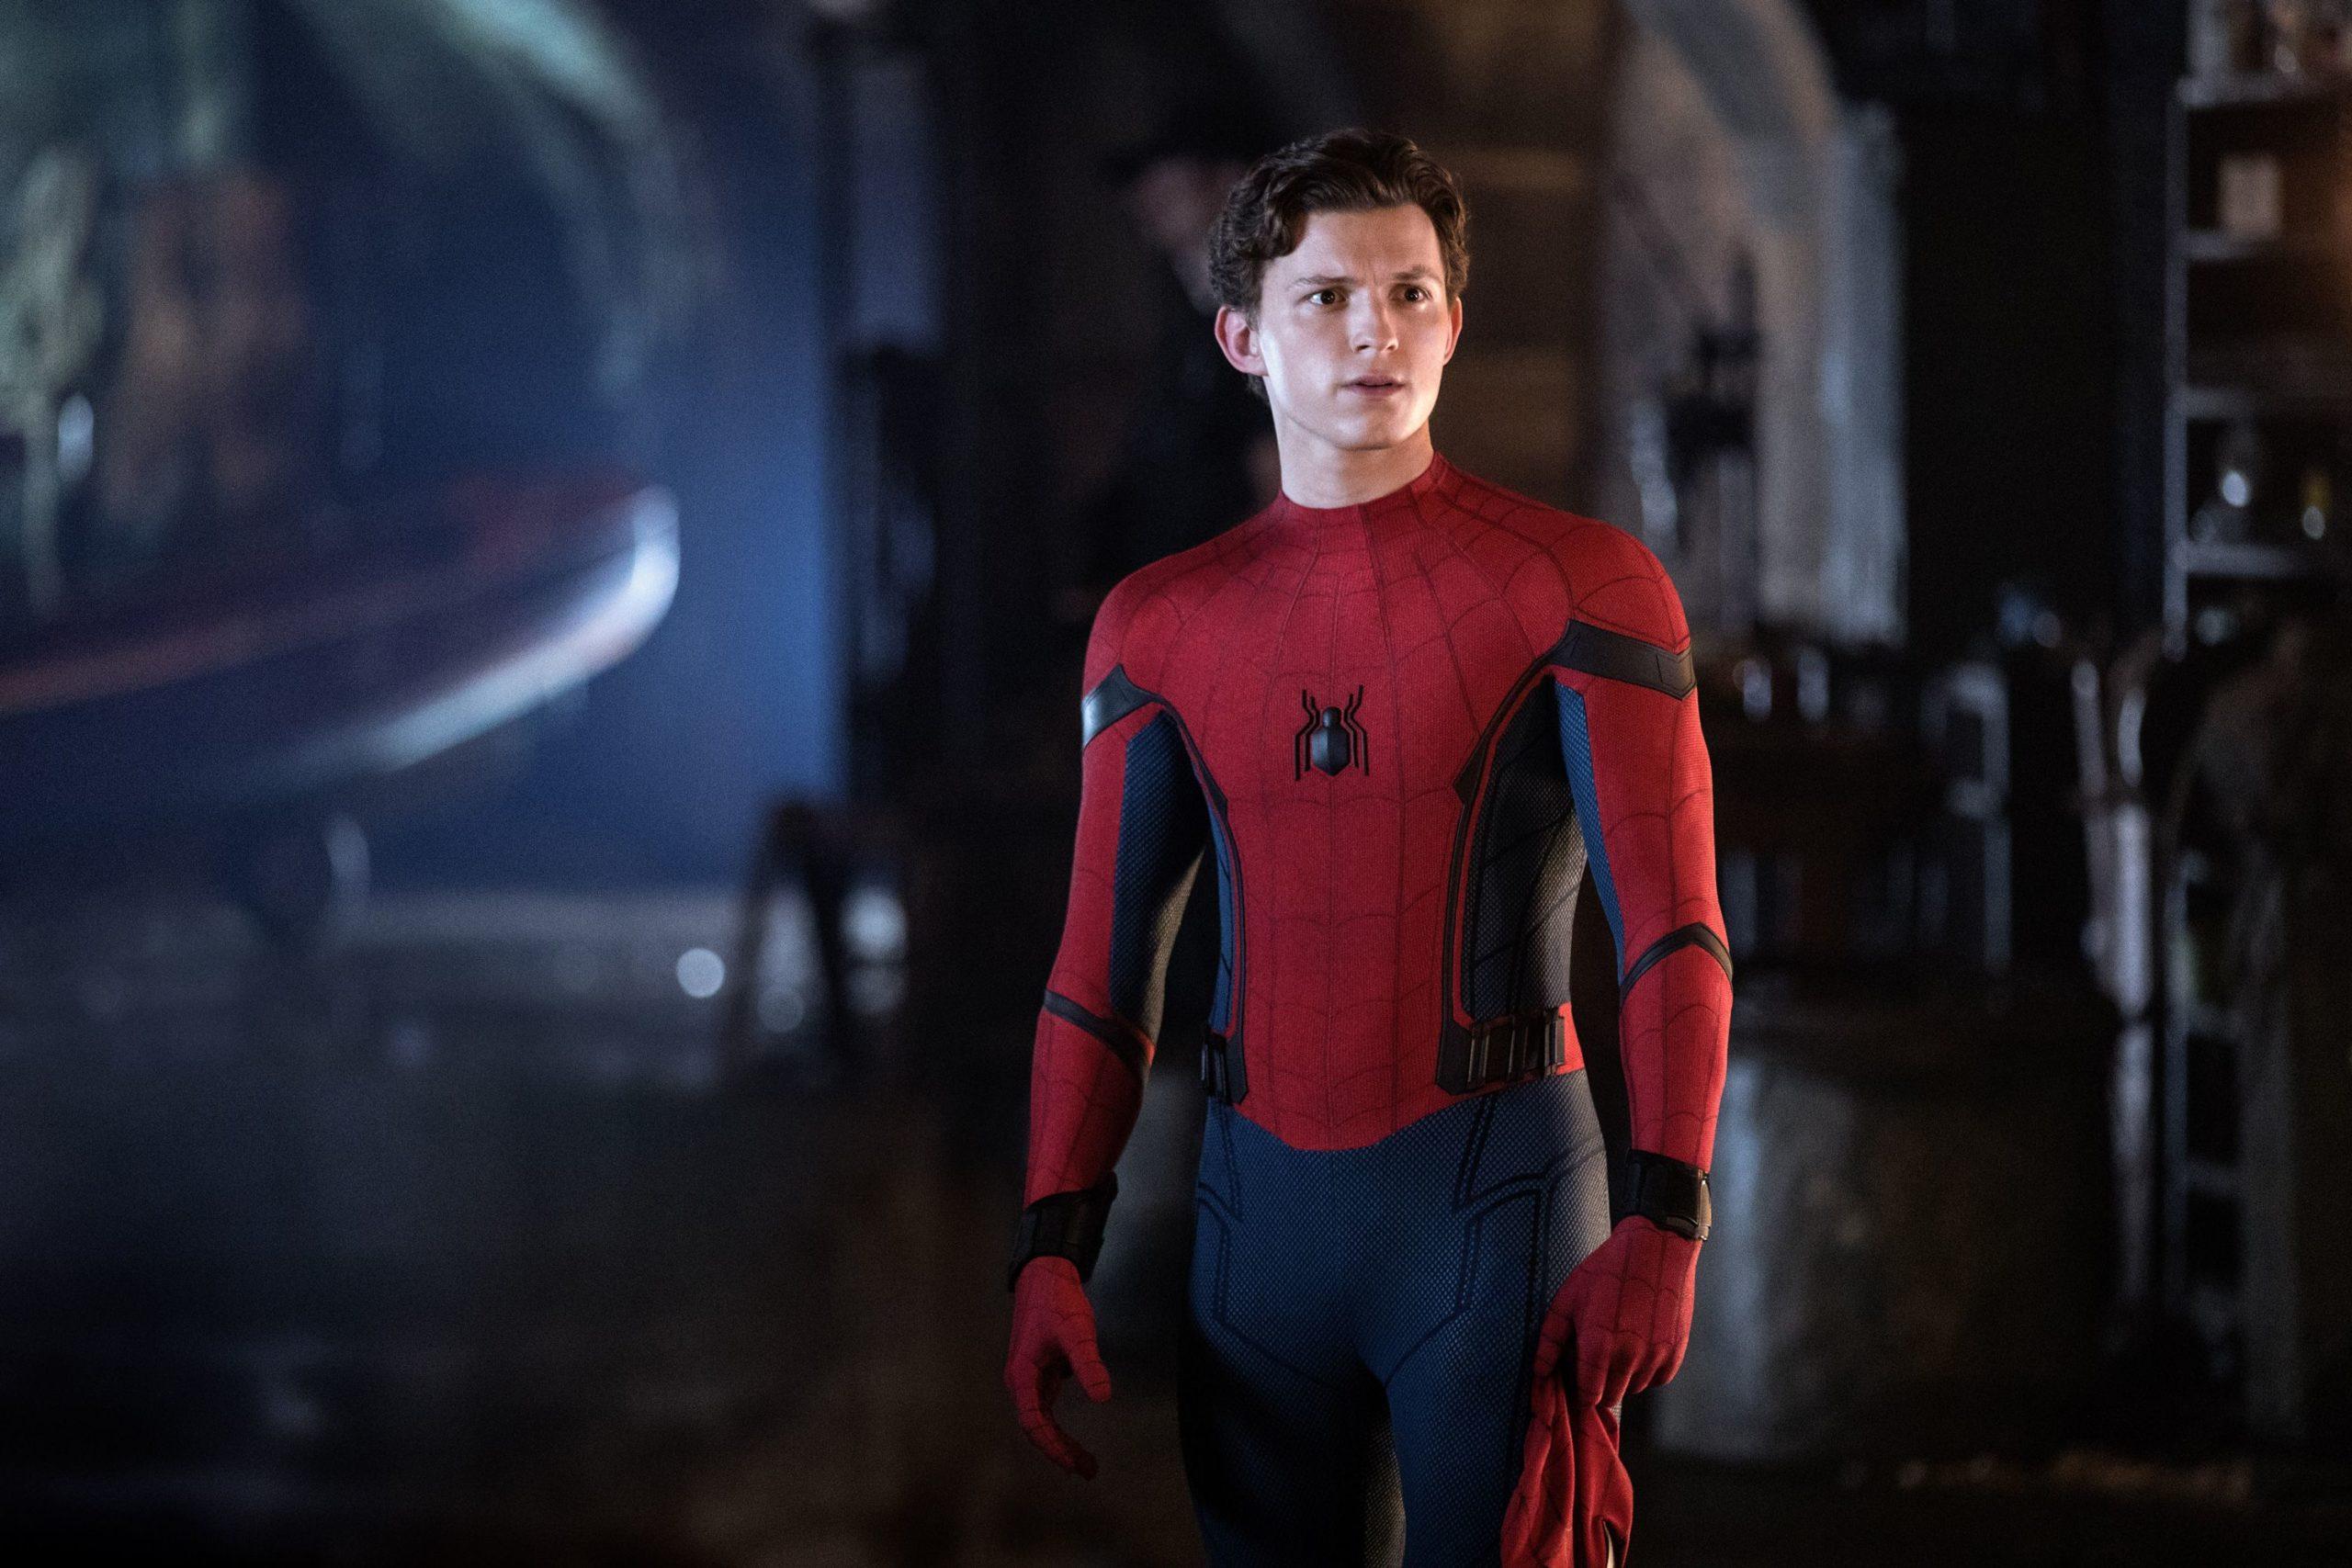 Spider-Man 3: We Have A Potential Opponent For Peter Parker